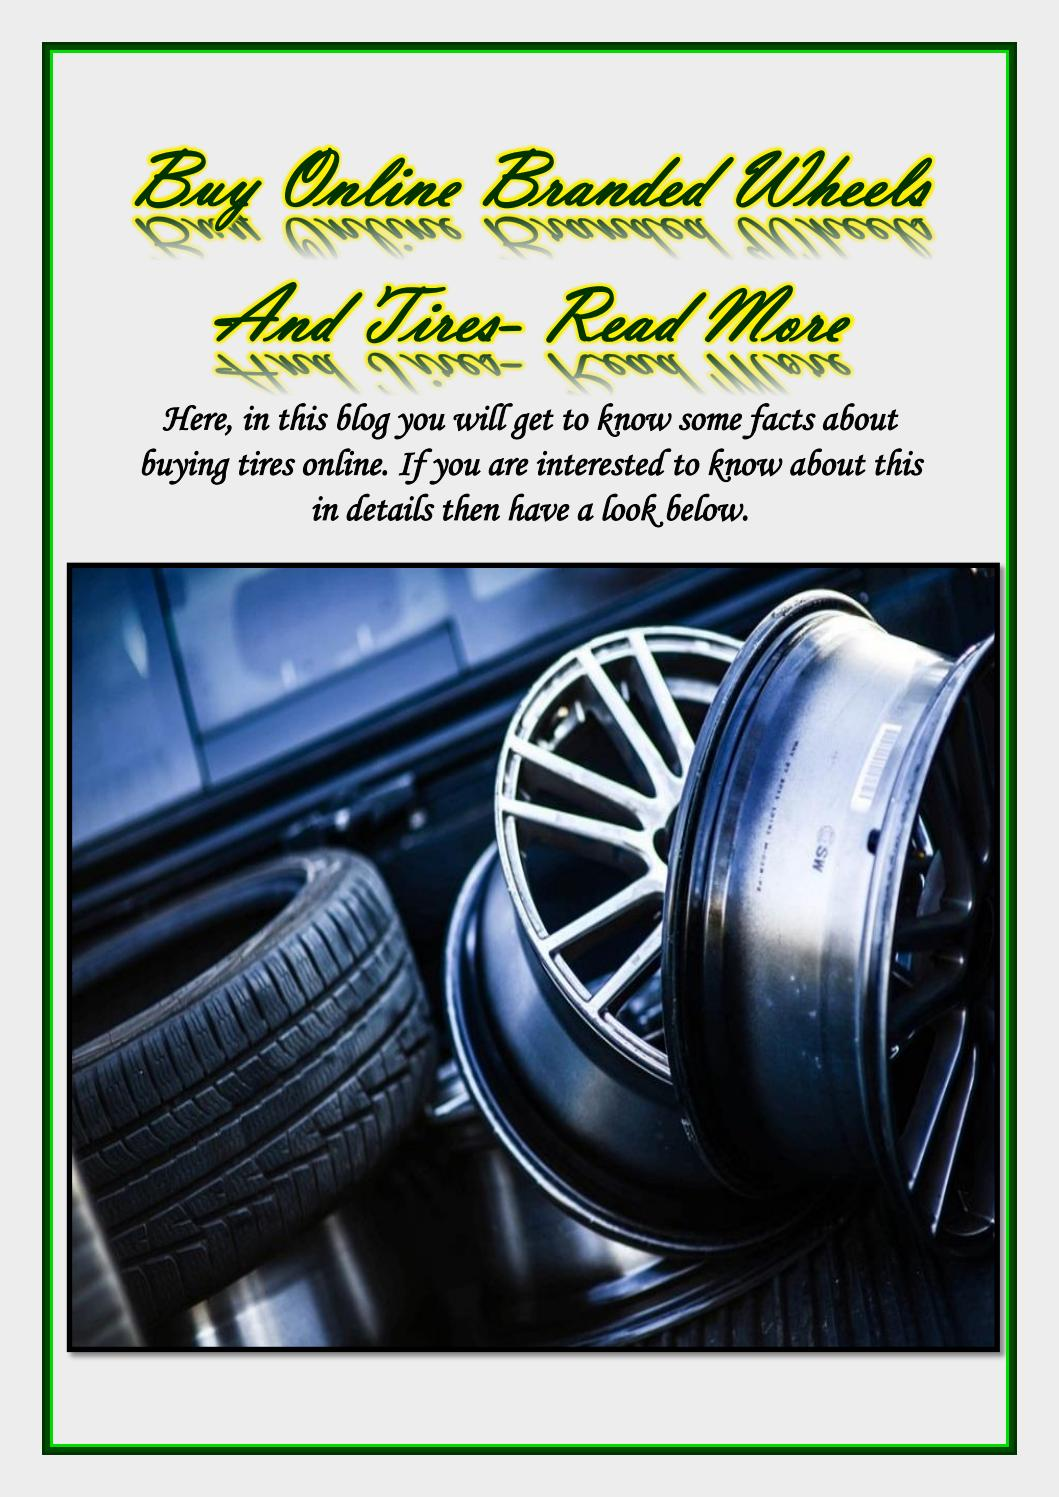 Buy Tires Online >> Buy Online Branded Wheels Tires By Itiresonline Issuu